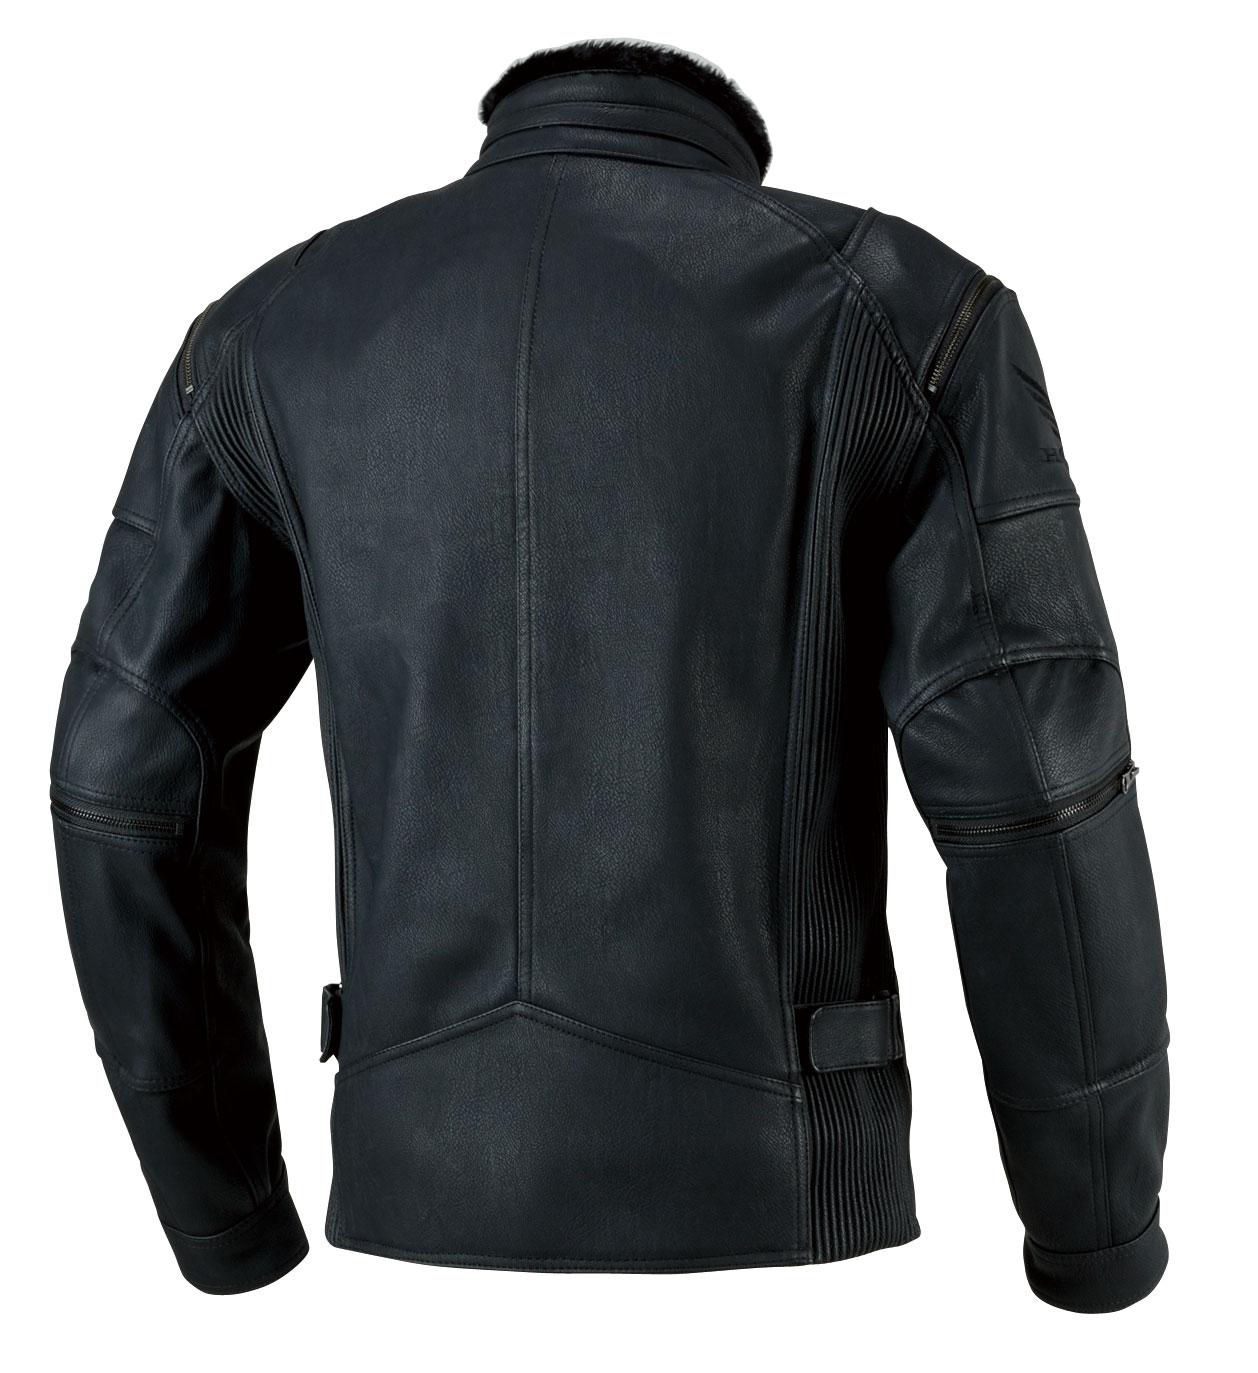 【HONDA RIDING GEAR】領子鋪毛騎士外套 - 「Webike-摩托百貨」